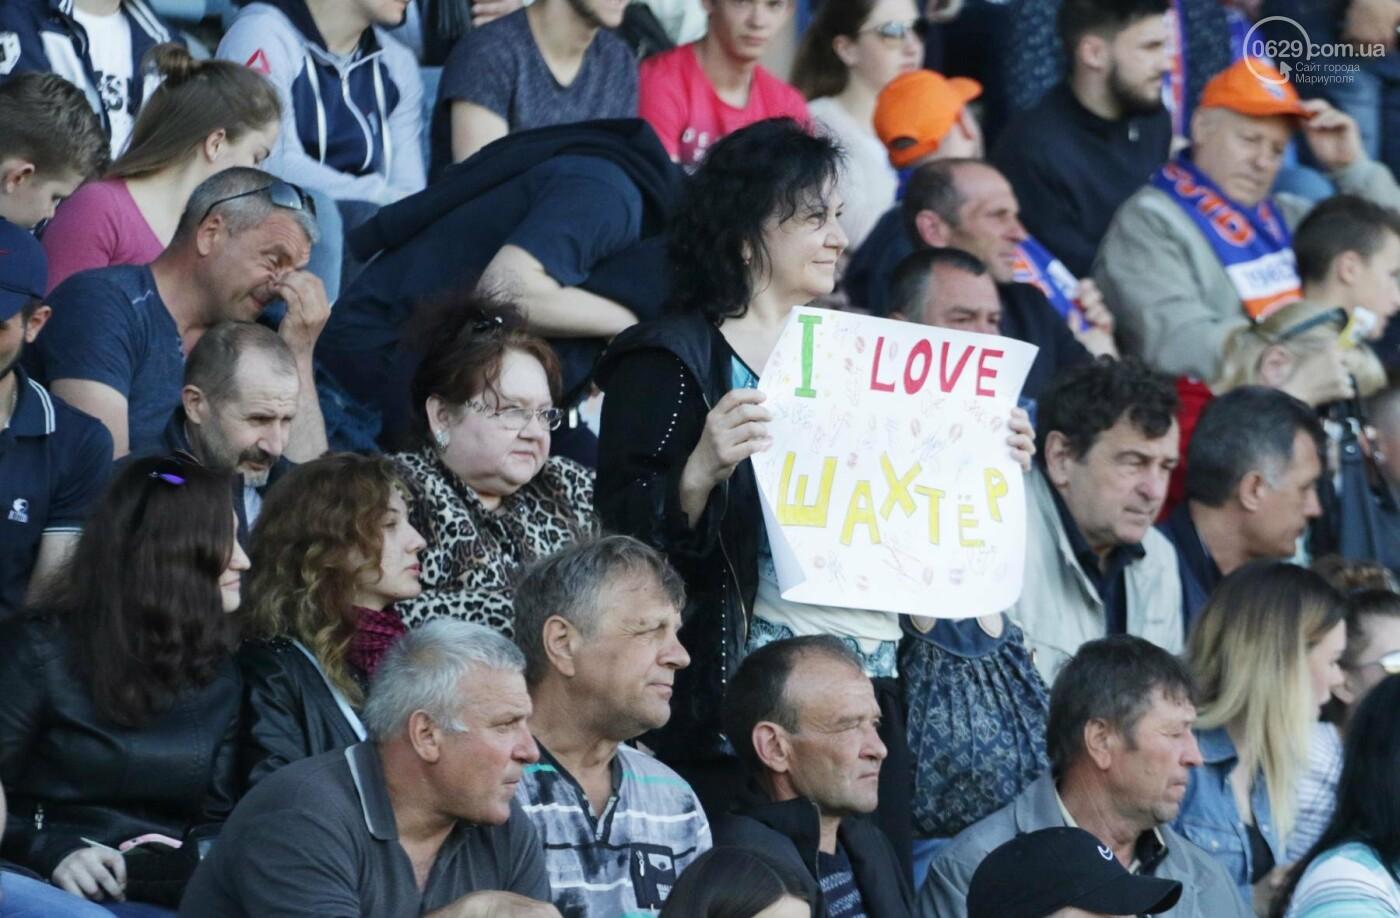 Шахтер с трудом переиграл Мариуполь - 1:0 (ФОТО), фото-10